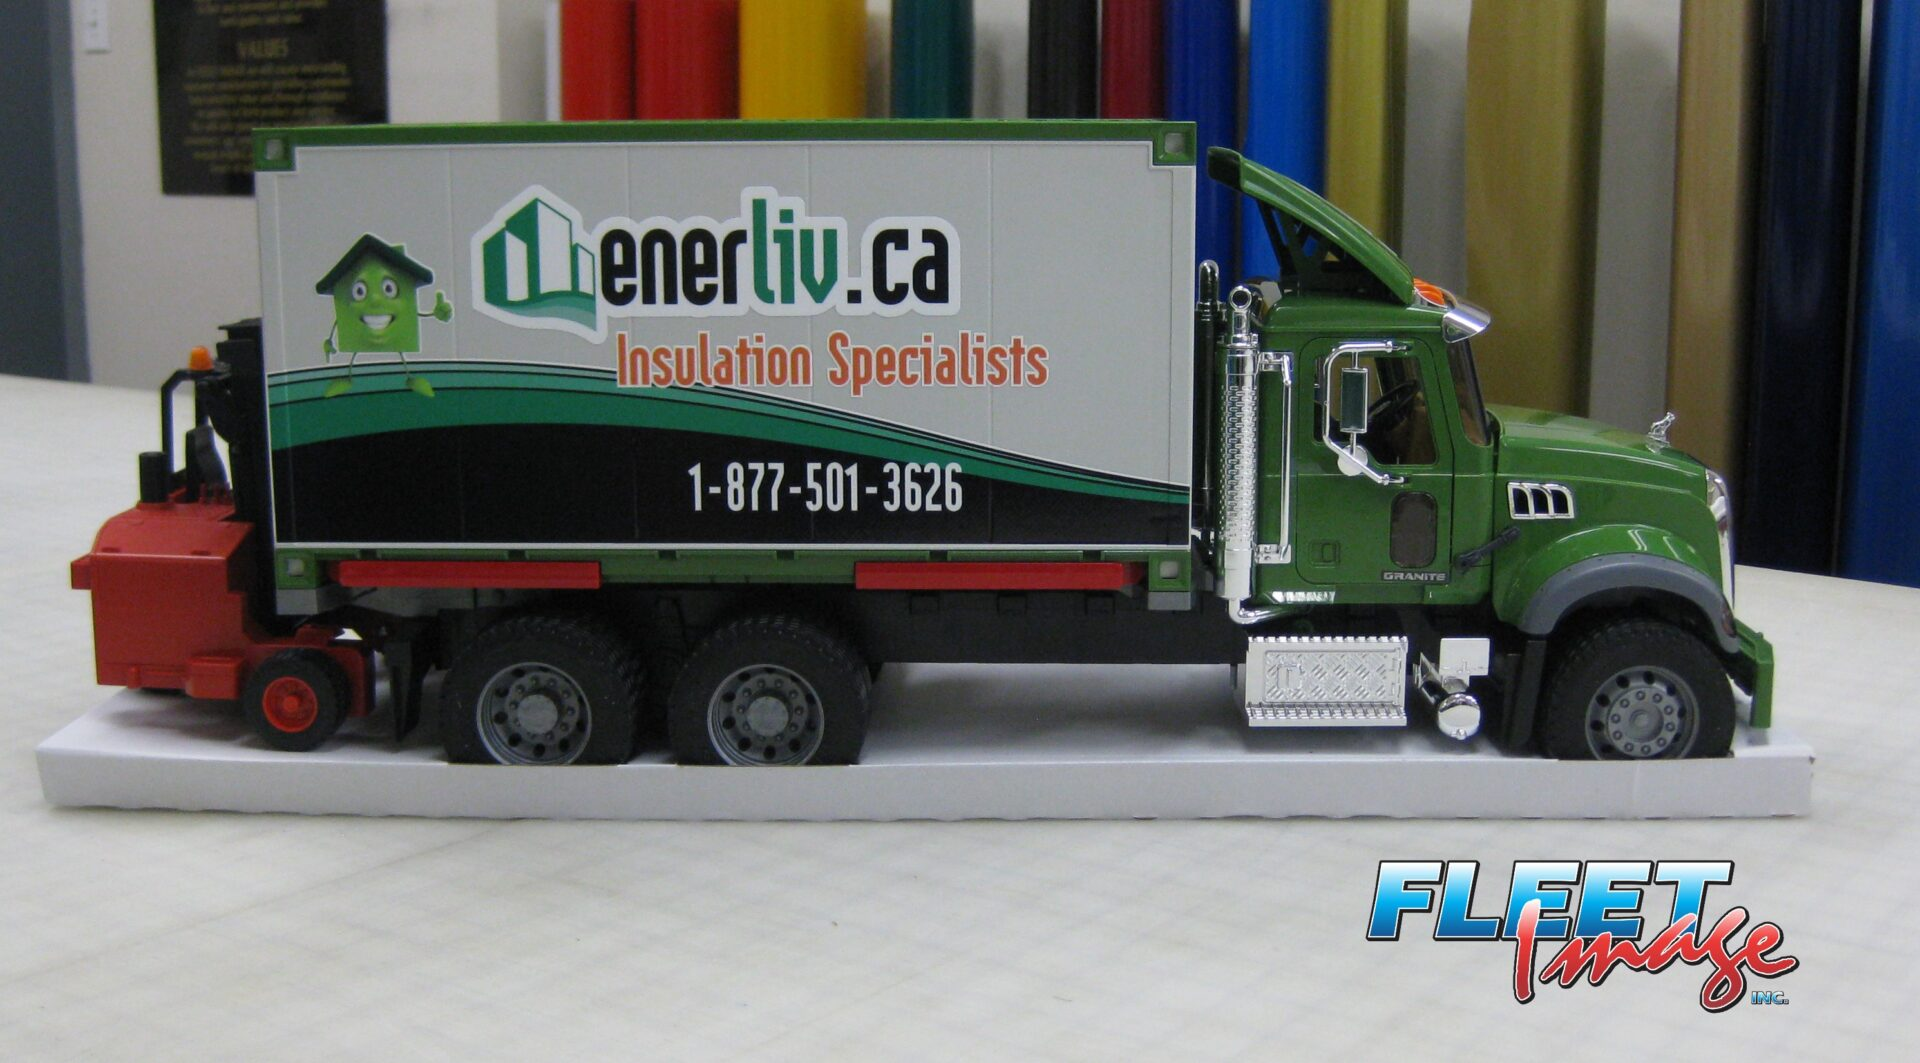 nerliv.ca Insulation Specialists sticker on a toy truck